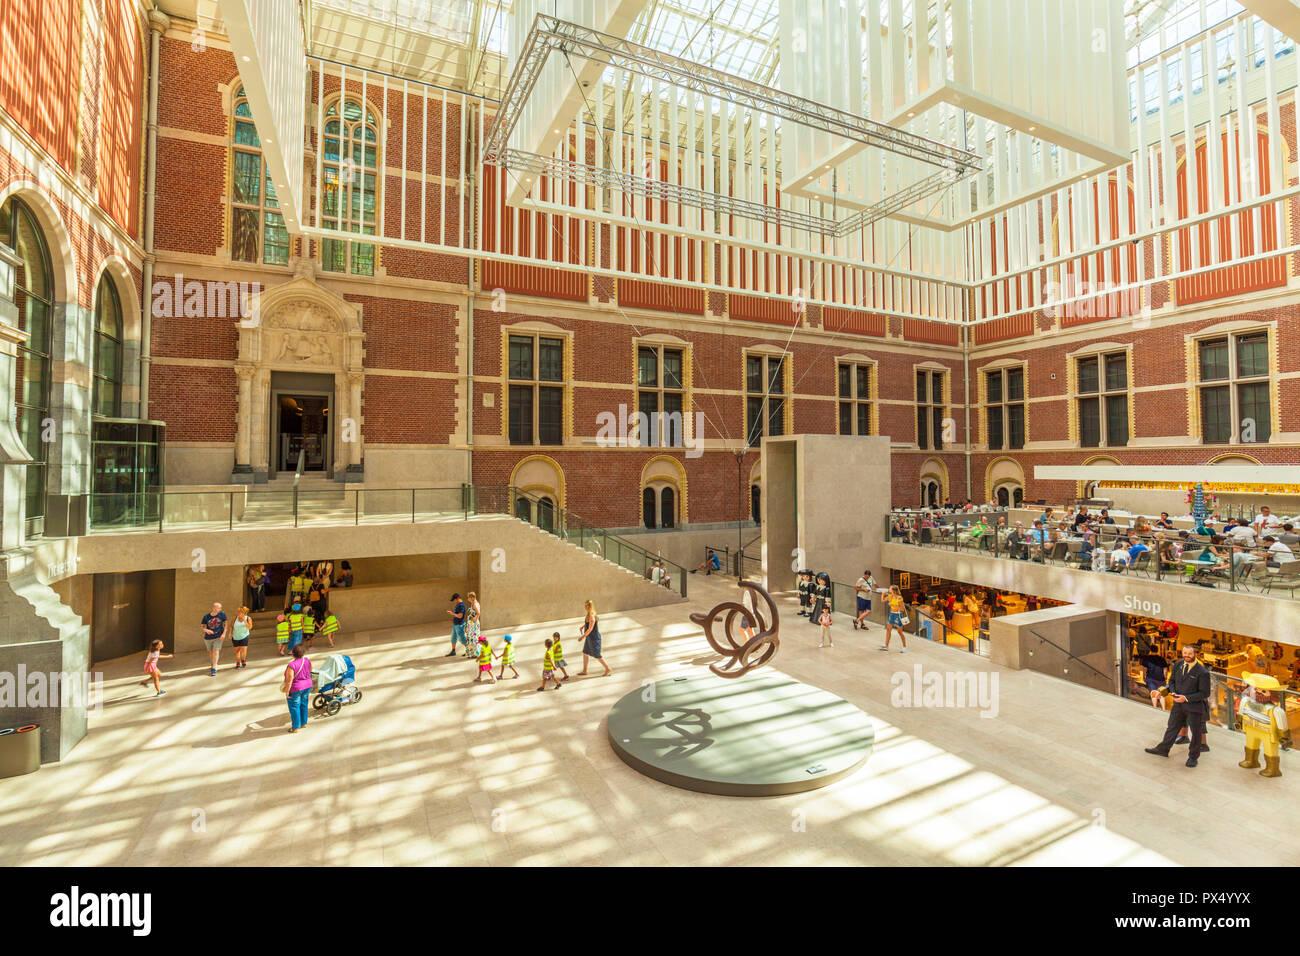 Amsterdam rijksmuseum amsterdam museum and art gallery entrance